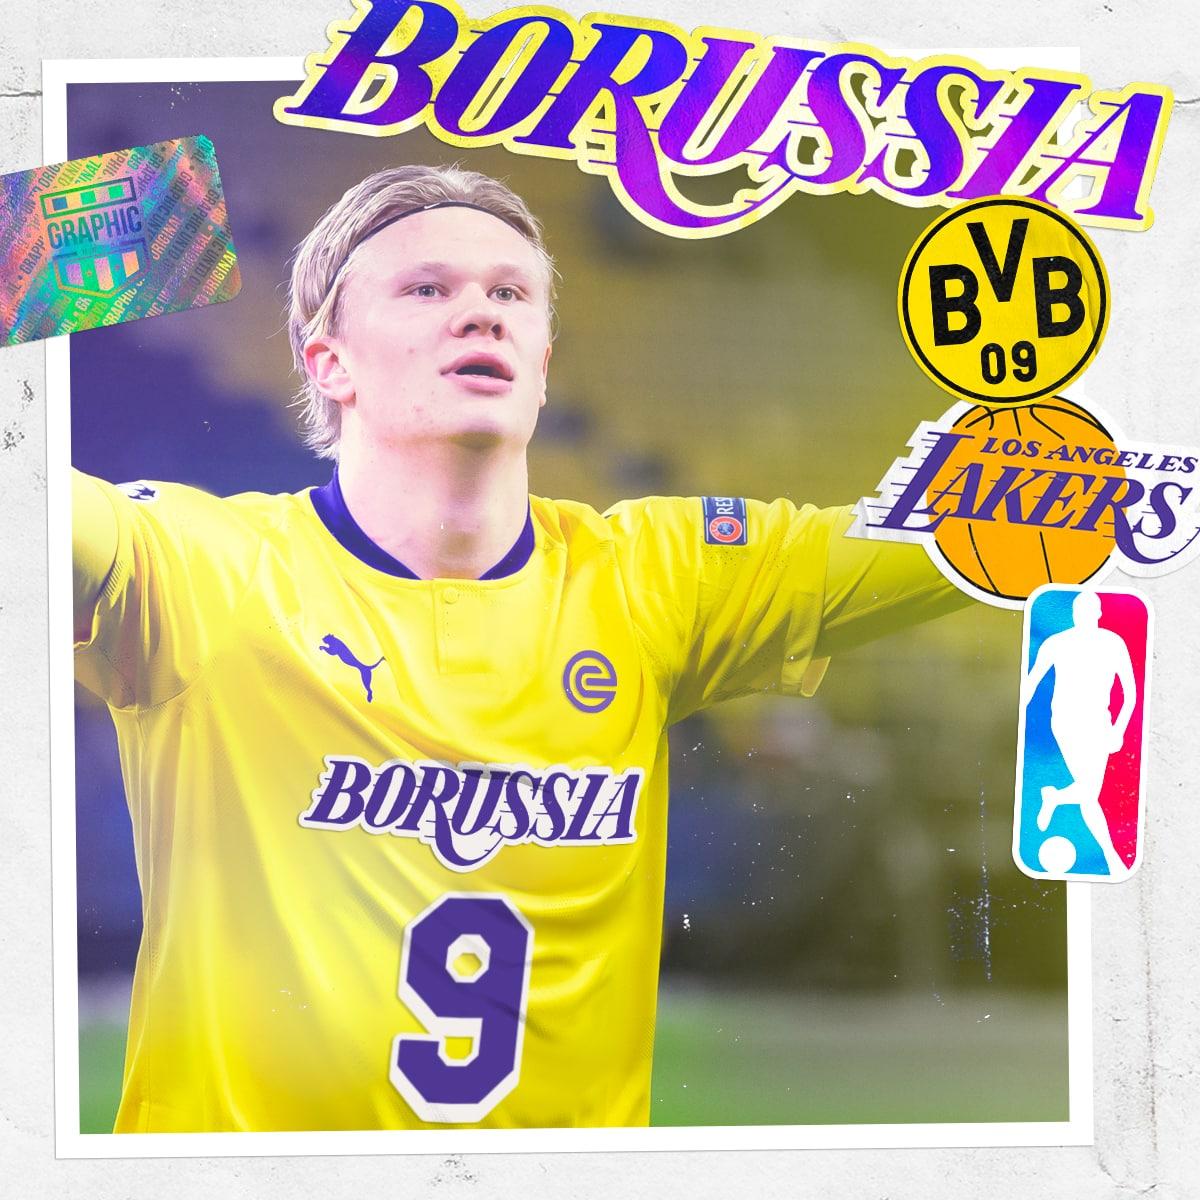 maillot-foot-nba-graphic-untd-borussia-dortmund-los-angeles-lakers